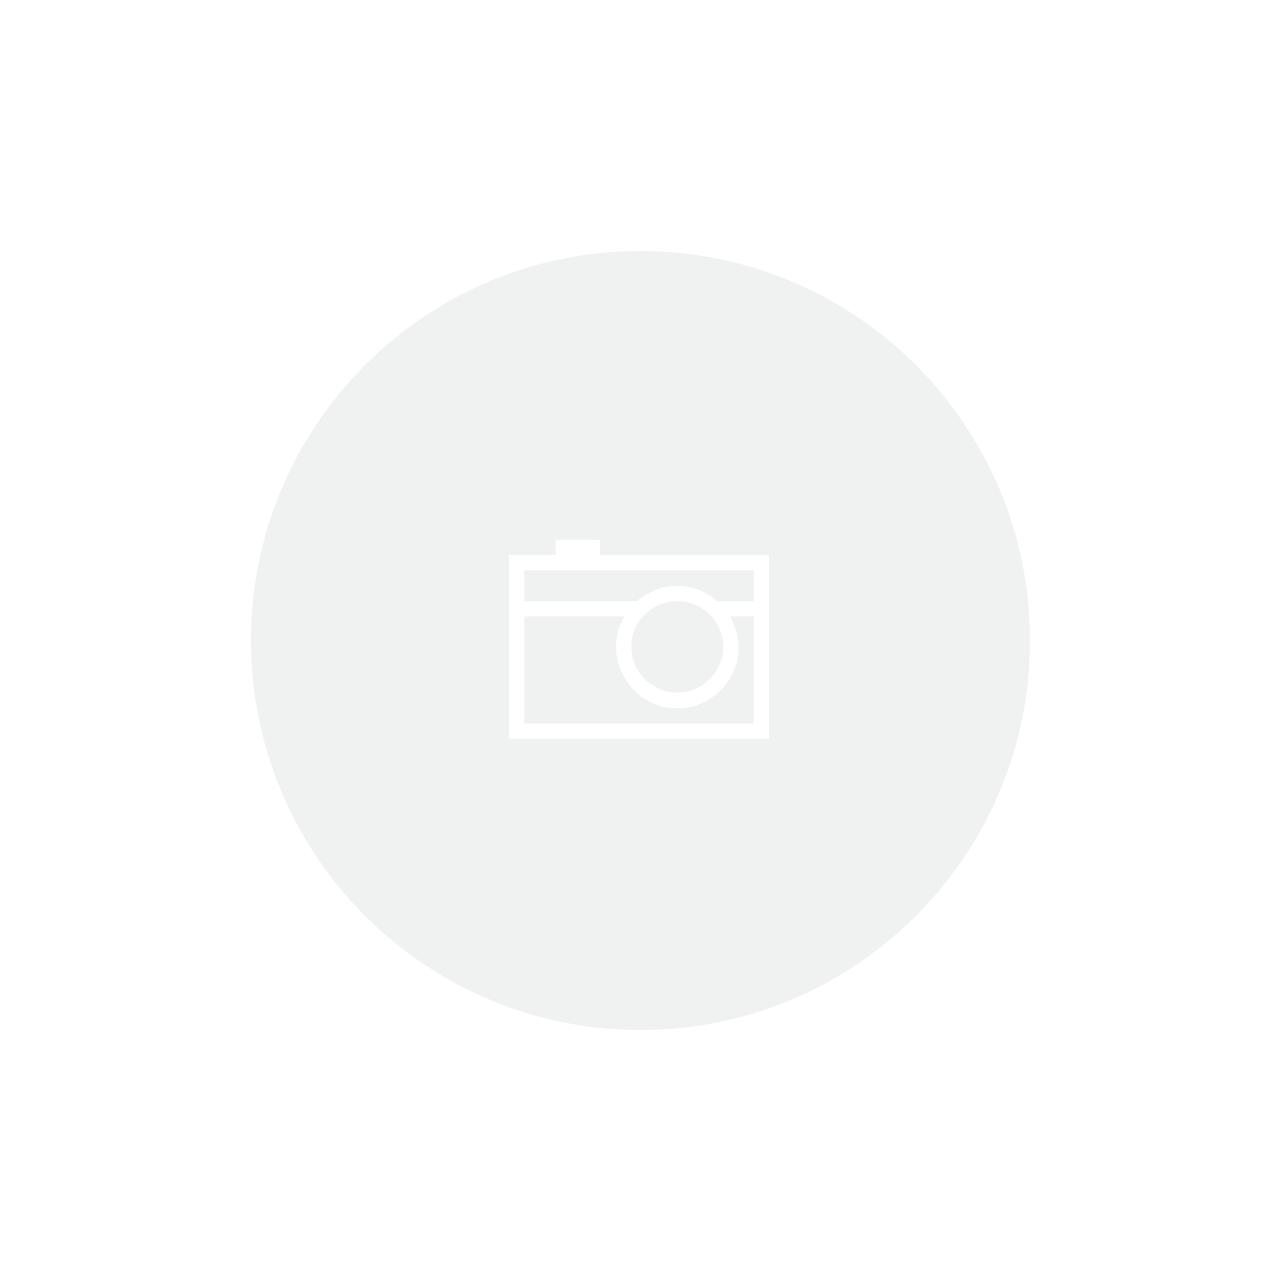 Black Vittoria Zaffiro 700 x 28 Road bike cycle tyre